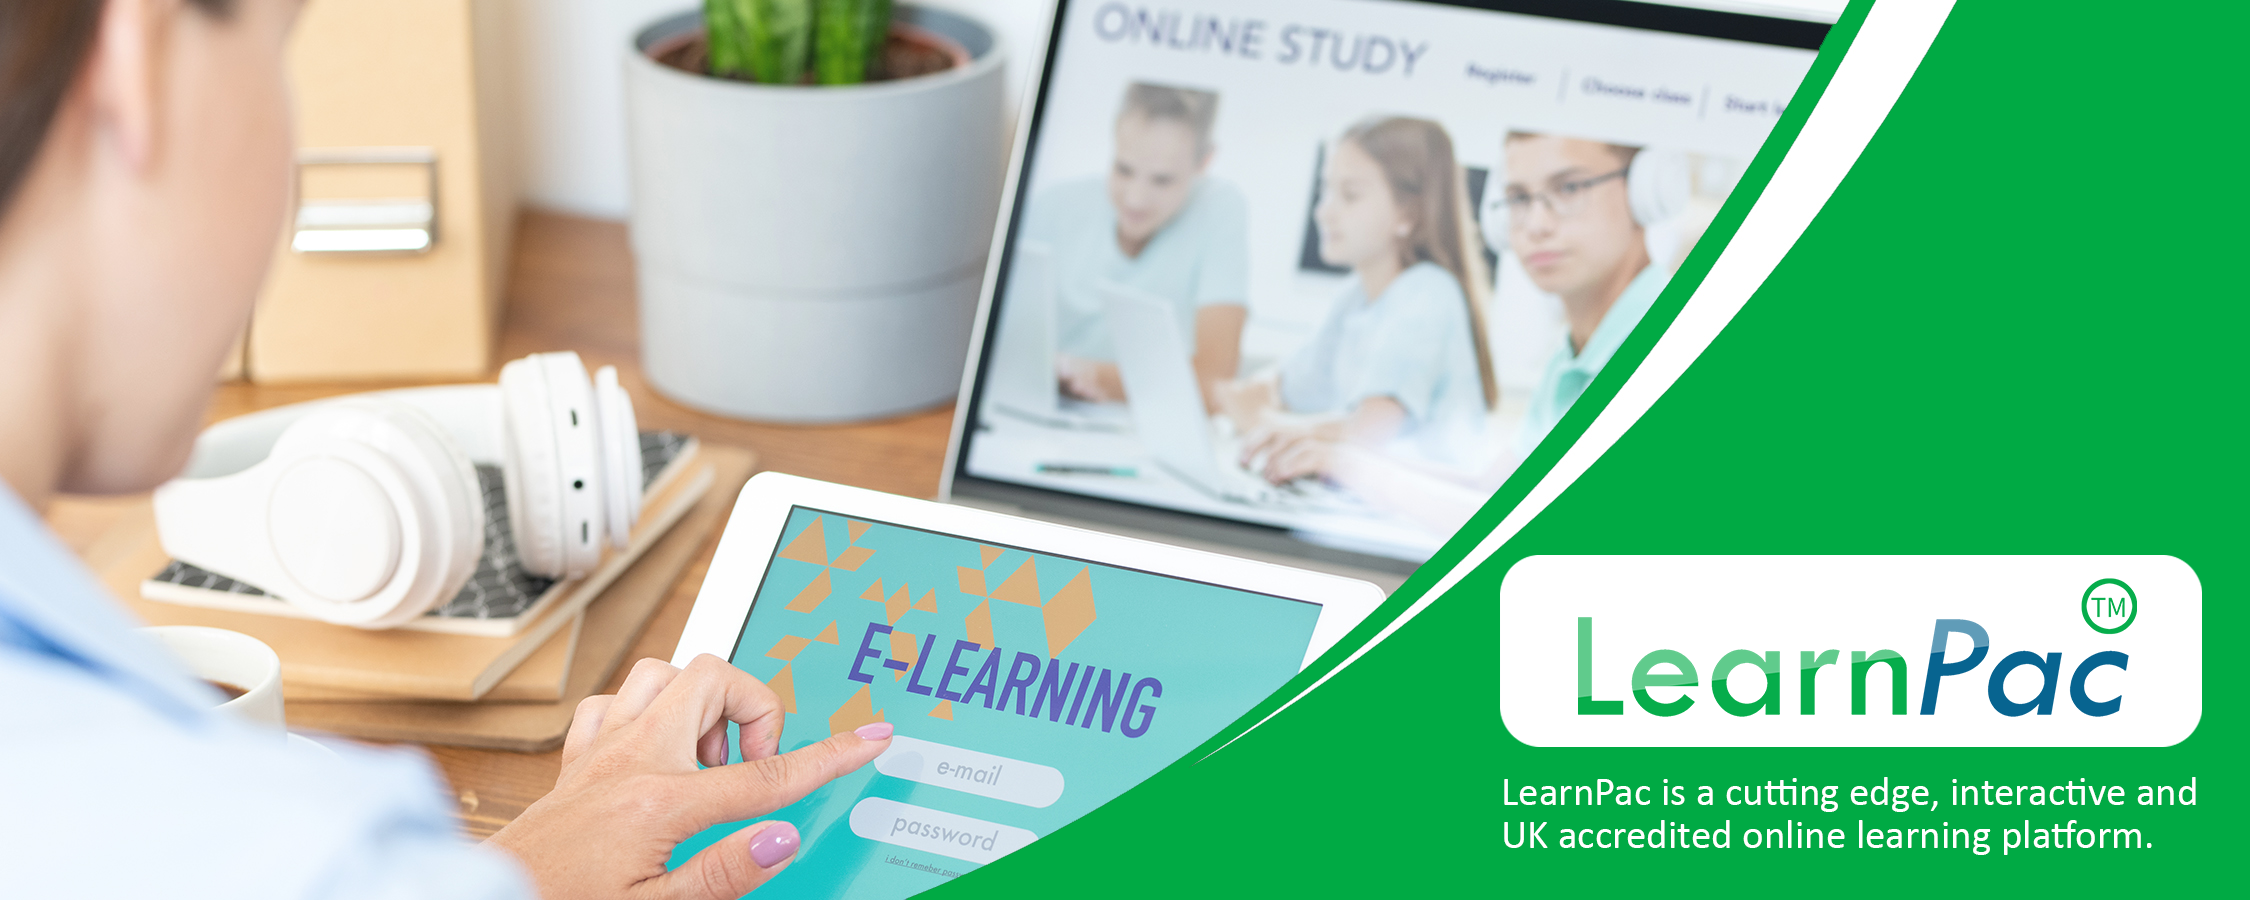 Taking Initiative Training - Online Learning Courses - E-Learning Courses - LearnPac Systems UK -